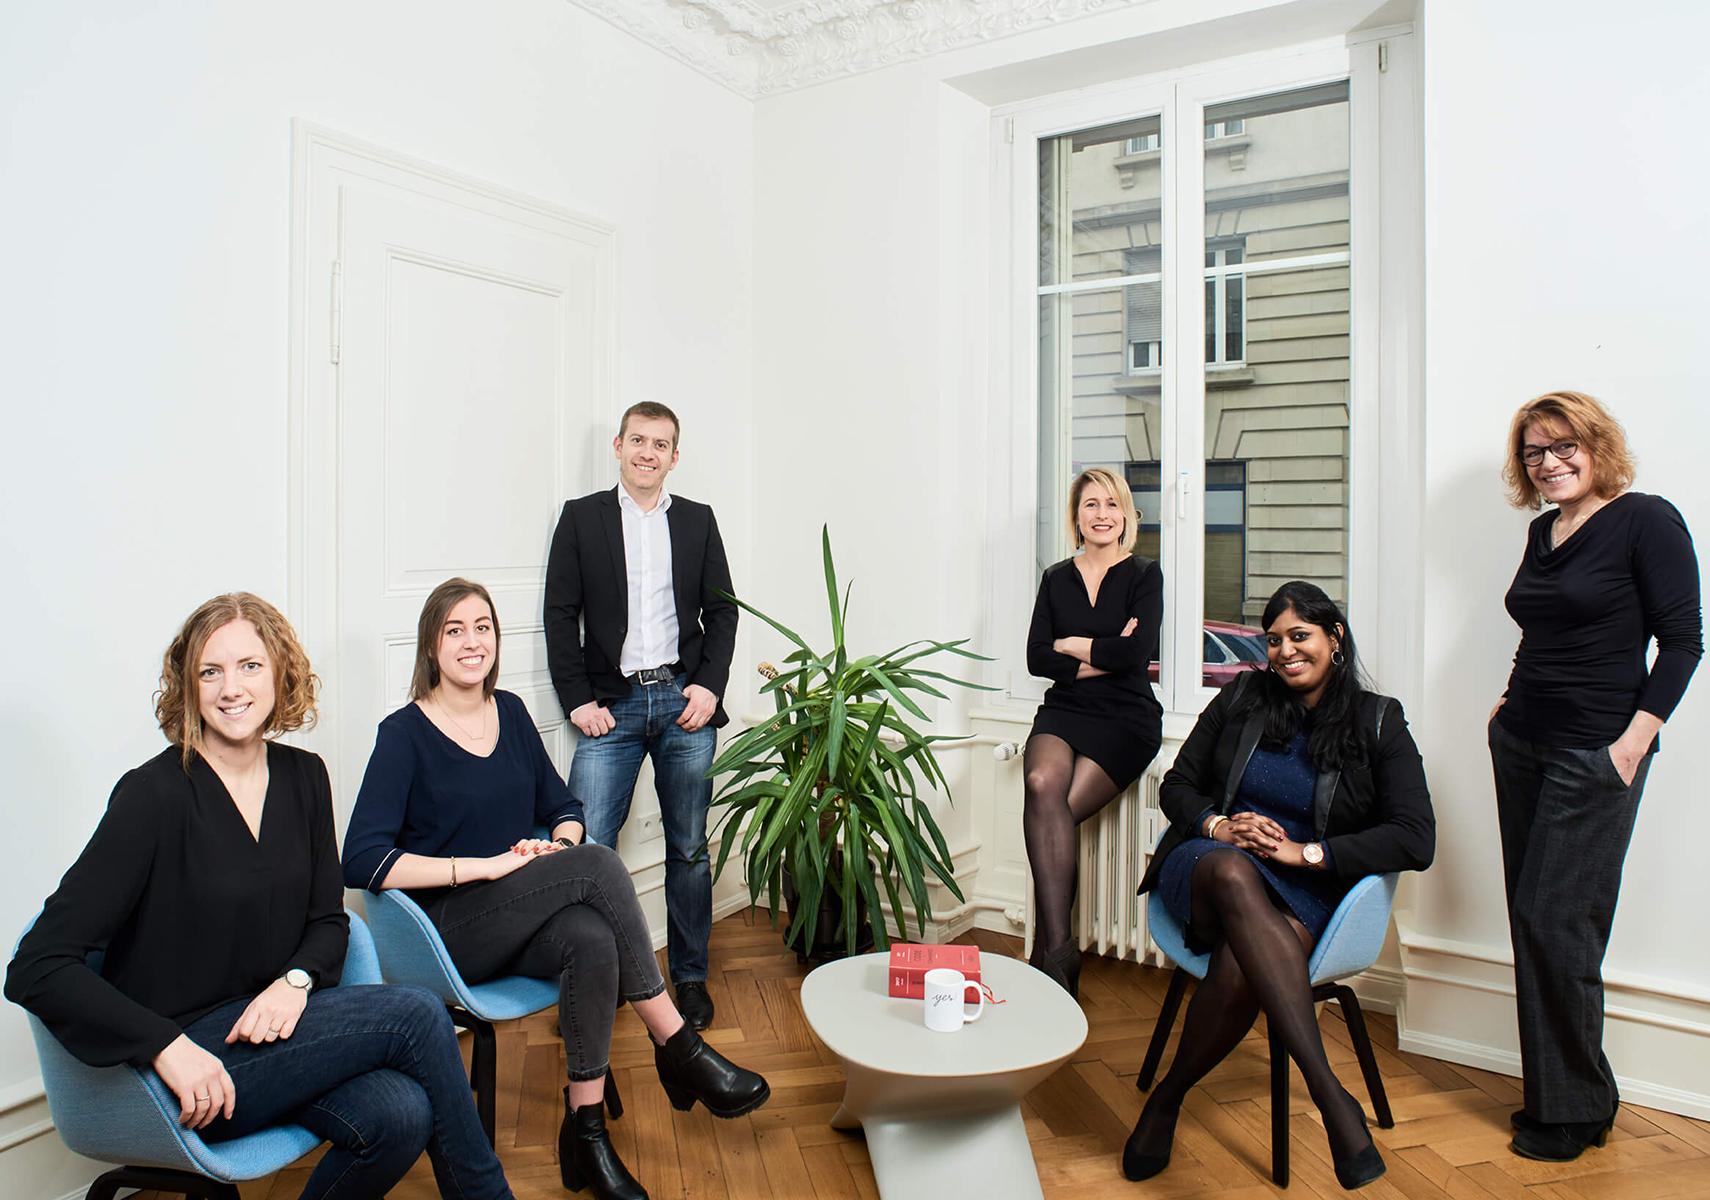 Cabinet avocat strasbourg - Cabinet conseil strasbourg ...